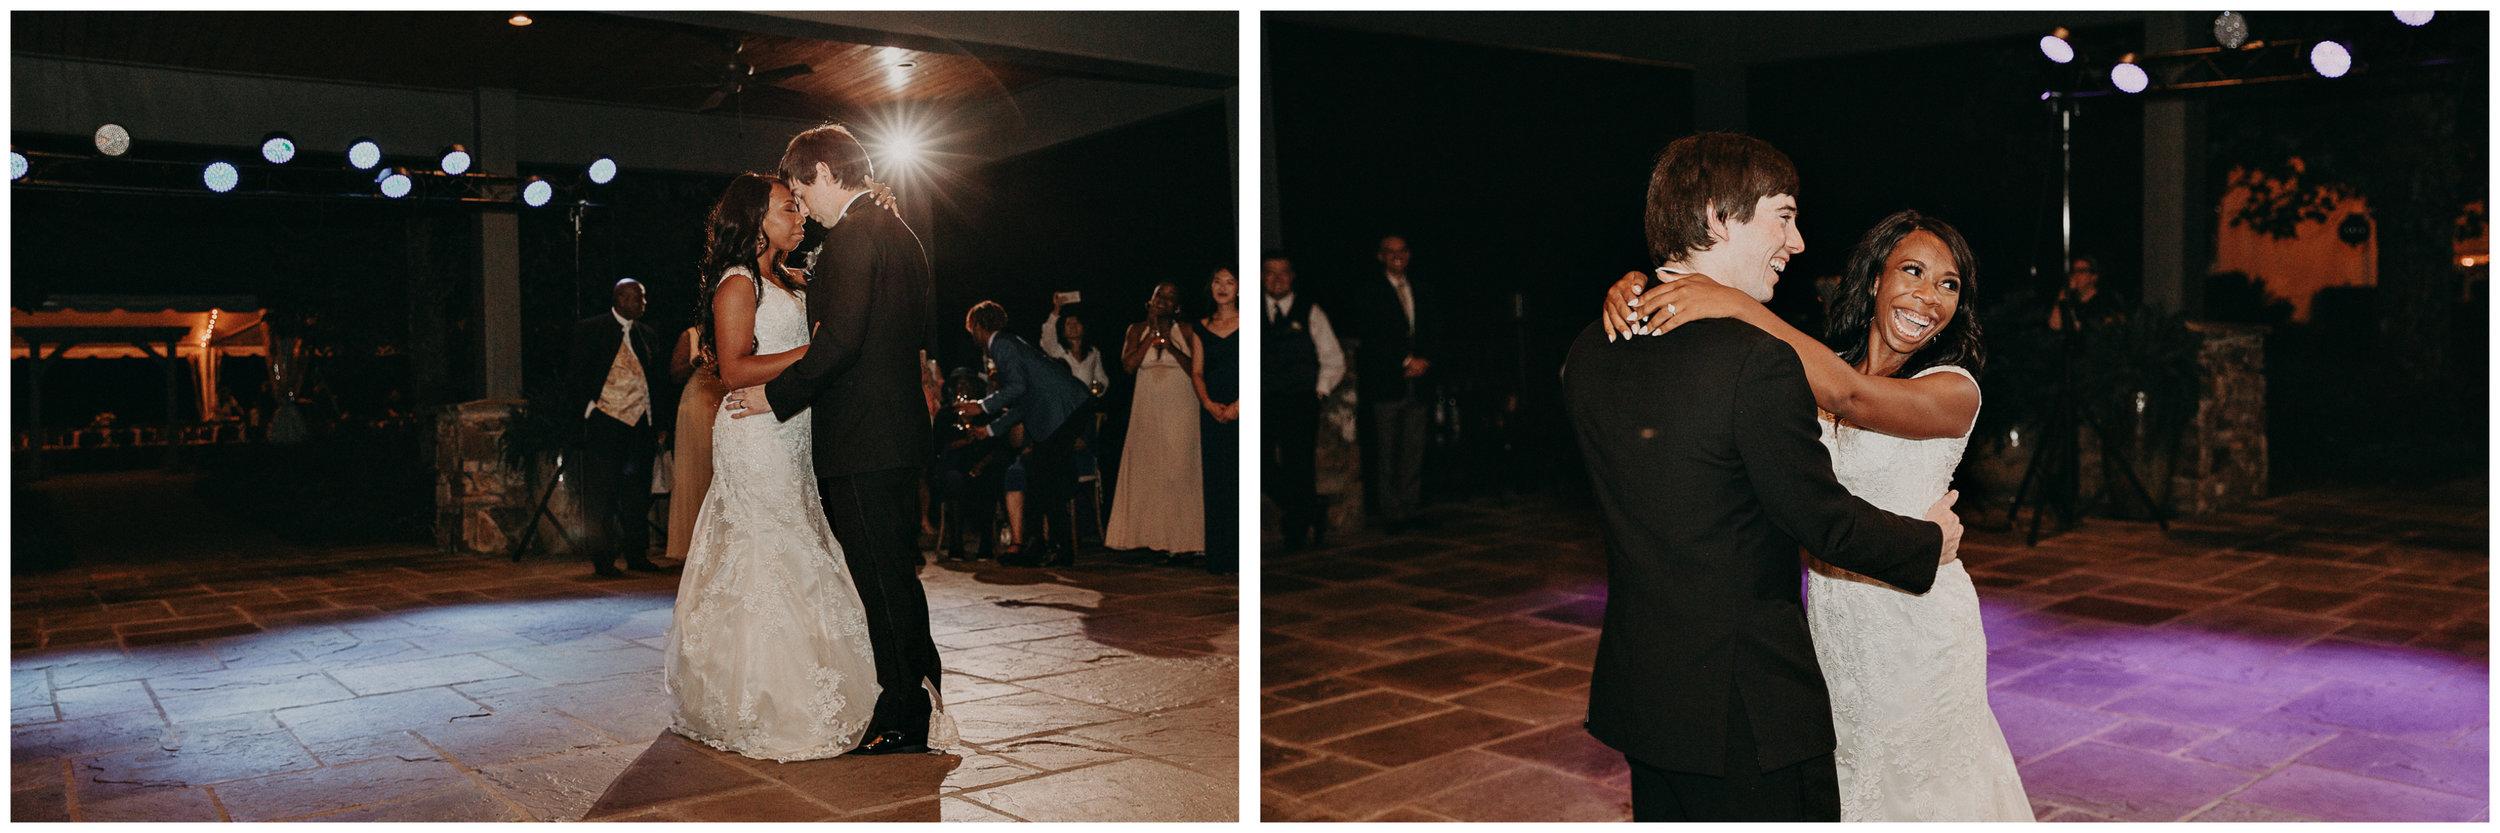 89- Kaya_vineyard_dahlonega_wedding_venue_detais_reception_aline_marin_photography.jpg